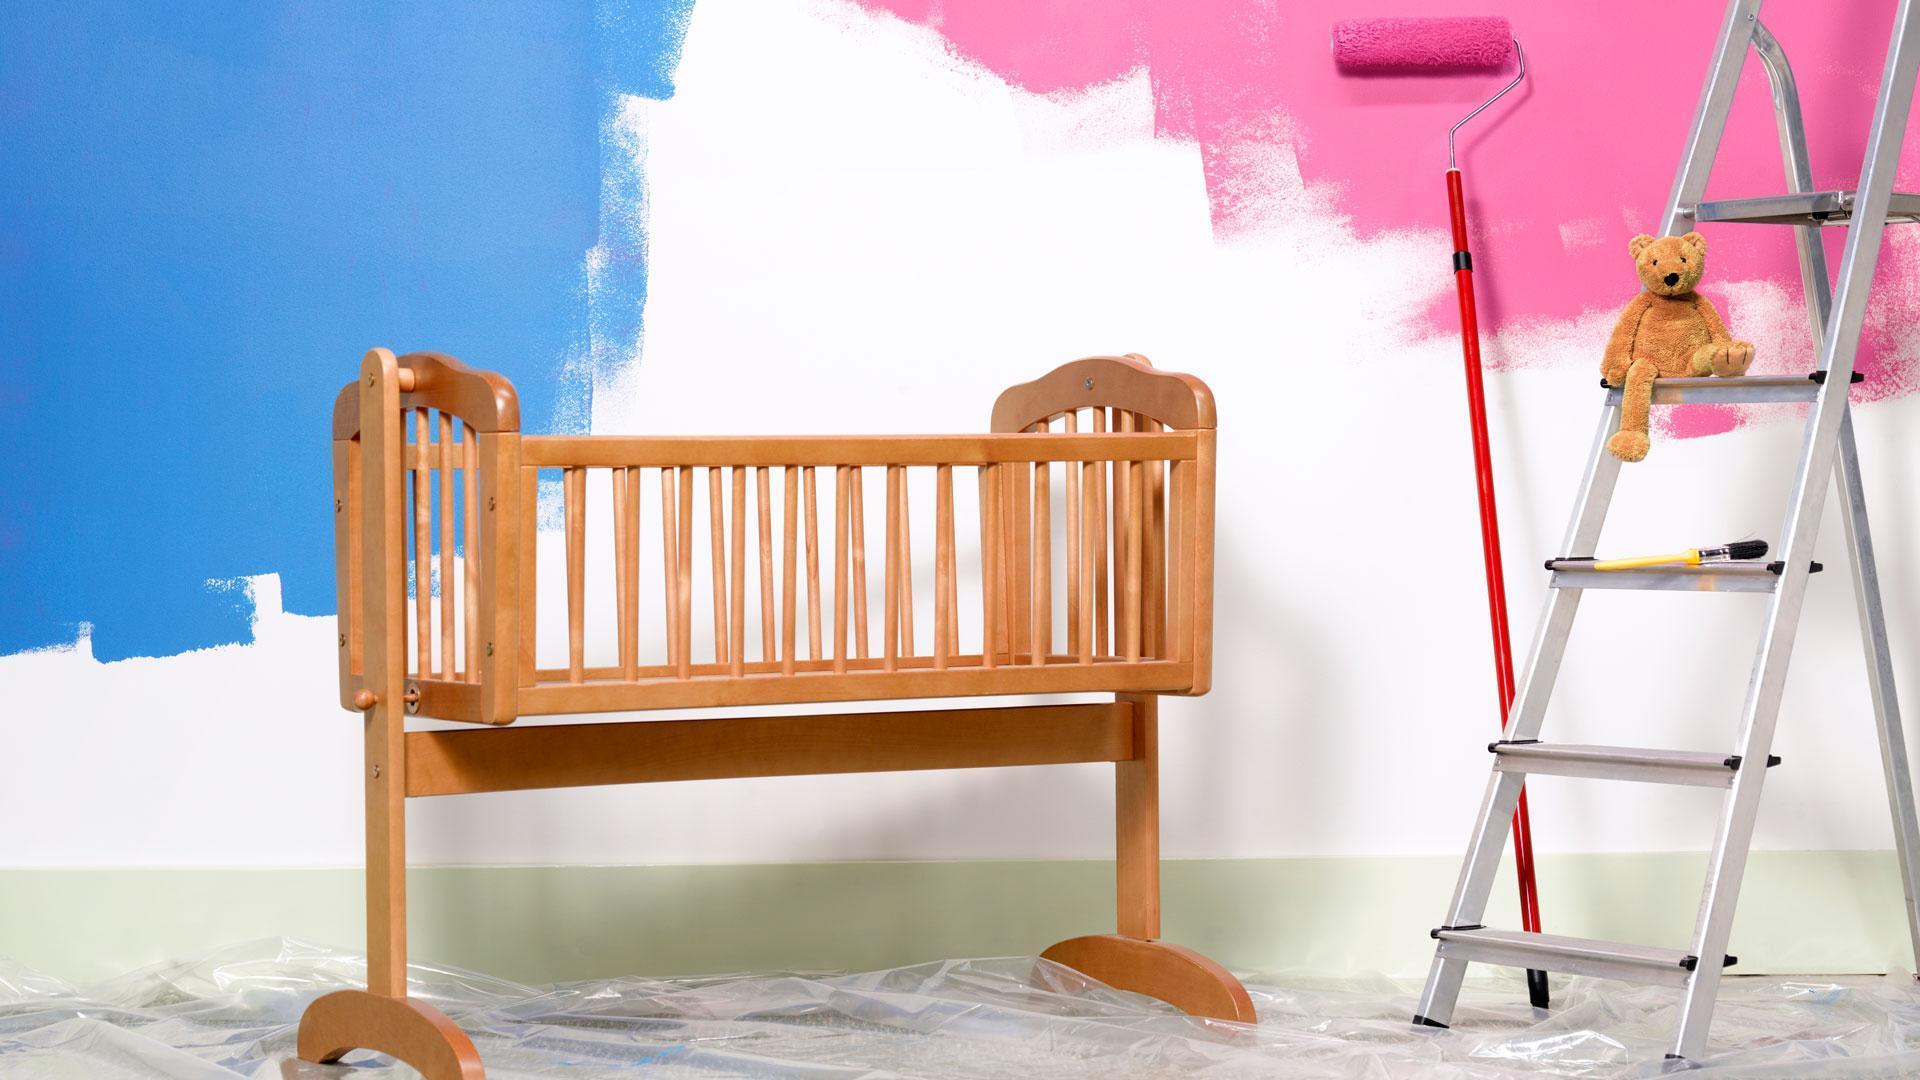 Star Crossed Babies! Newborns named Romeo and Juliet Born Hours Apart in South Carolina Hospital